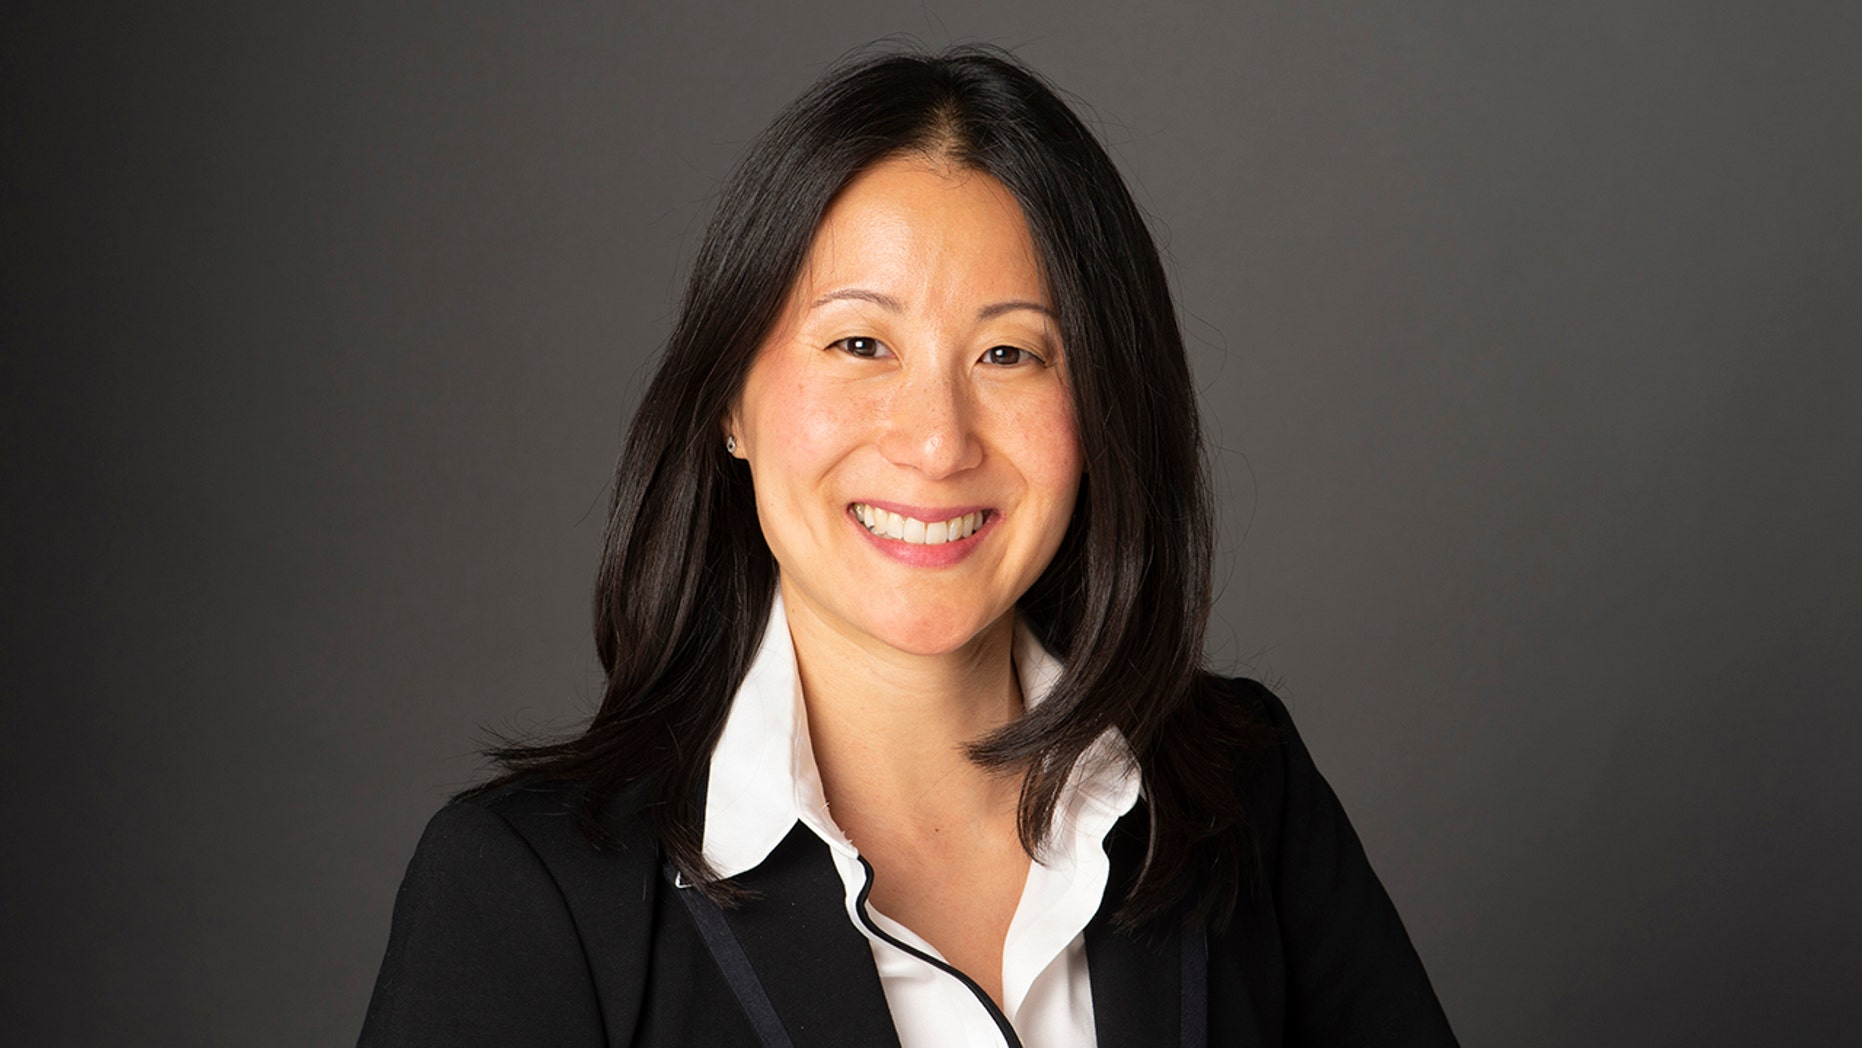 Westlake Legal Group OLY-Li-Li-Leung New USA Gymnastics president points to 'positive trajectory' fox-news/sports/olympics fnc/sports fnc Associated Press article 68f56e3f-7897-52cc-897f-ad8d11c785ef